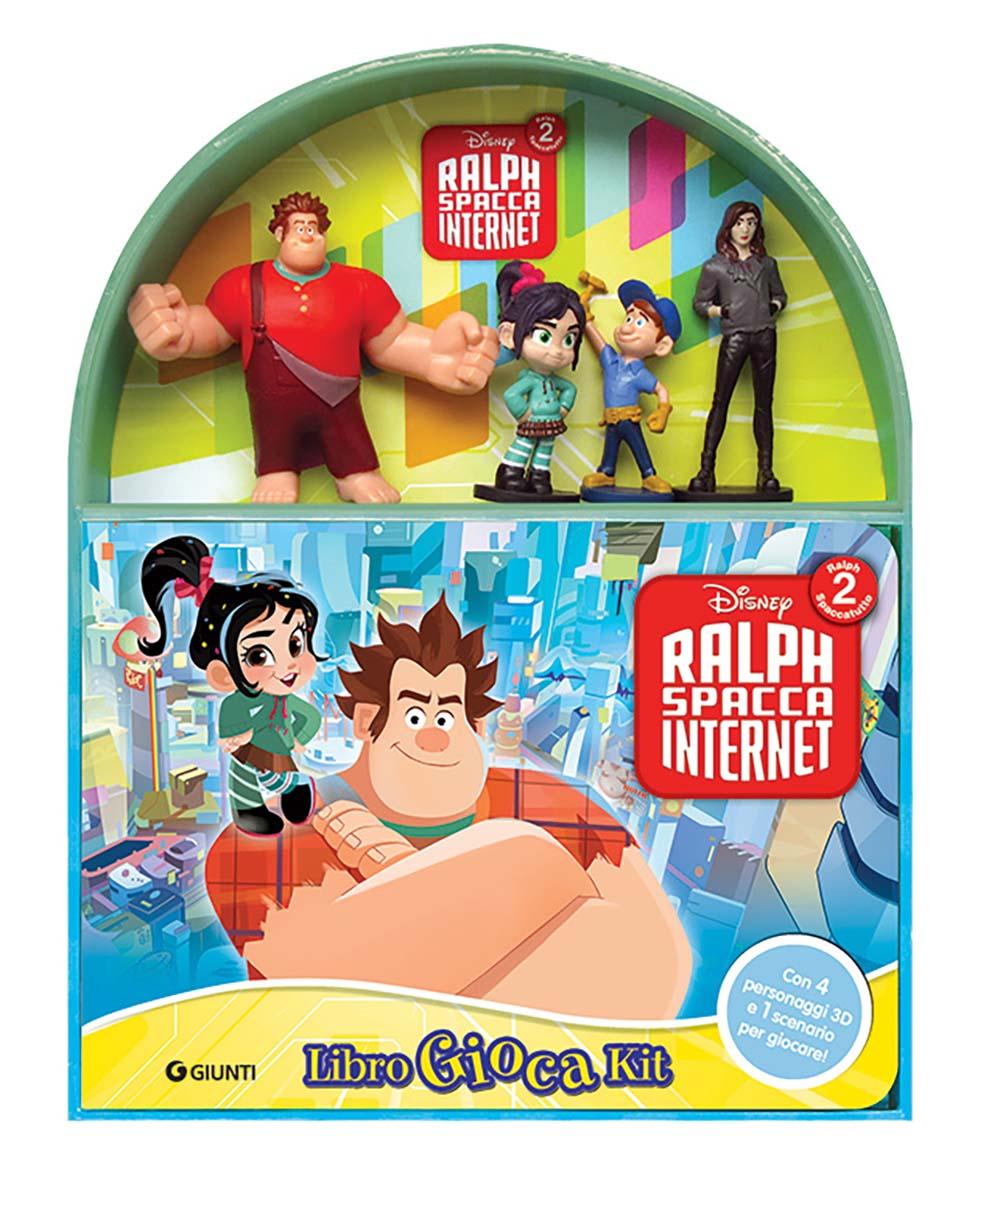 Ralph Spacca Internet - LibroGiocaKit